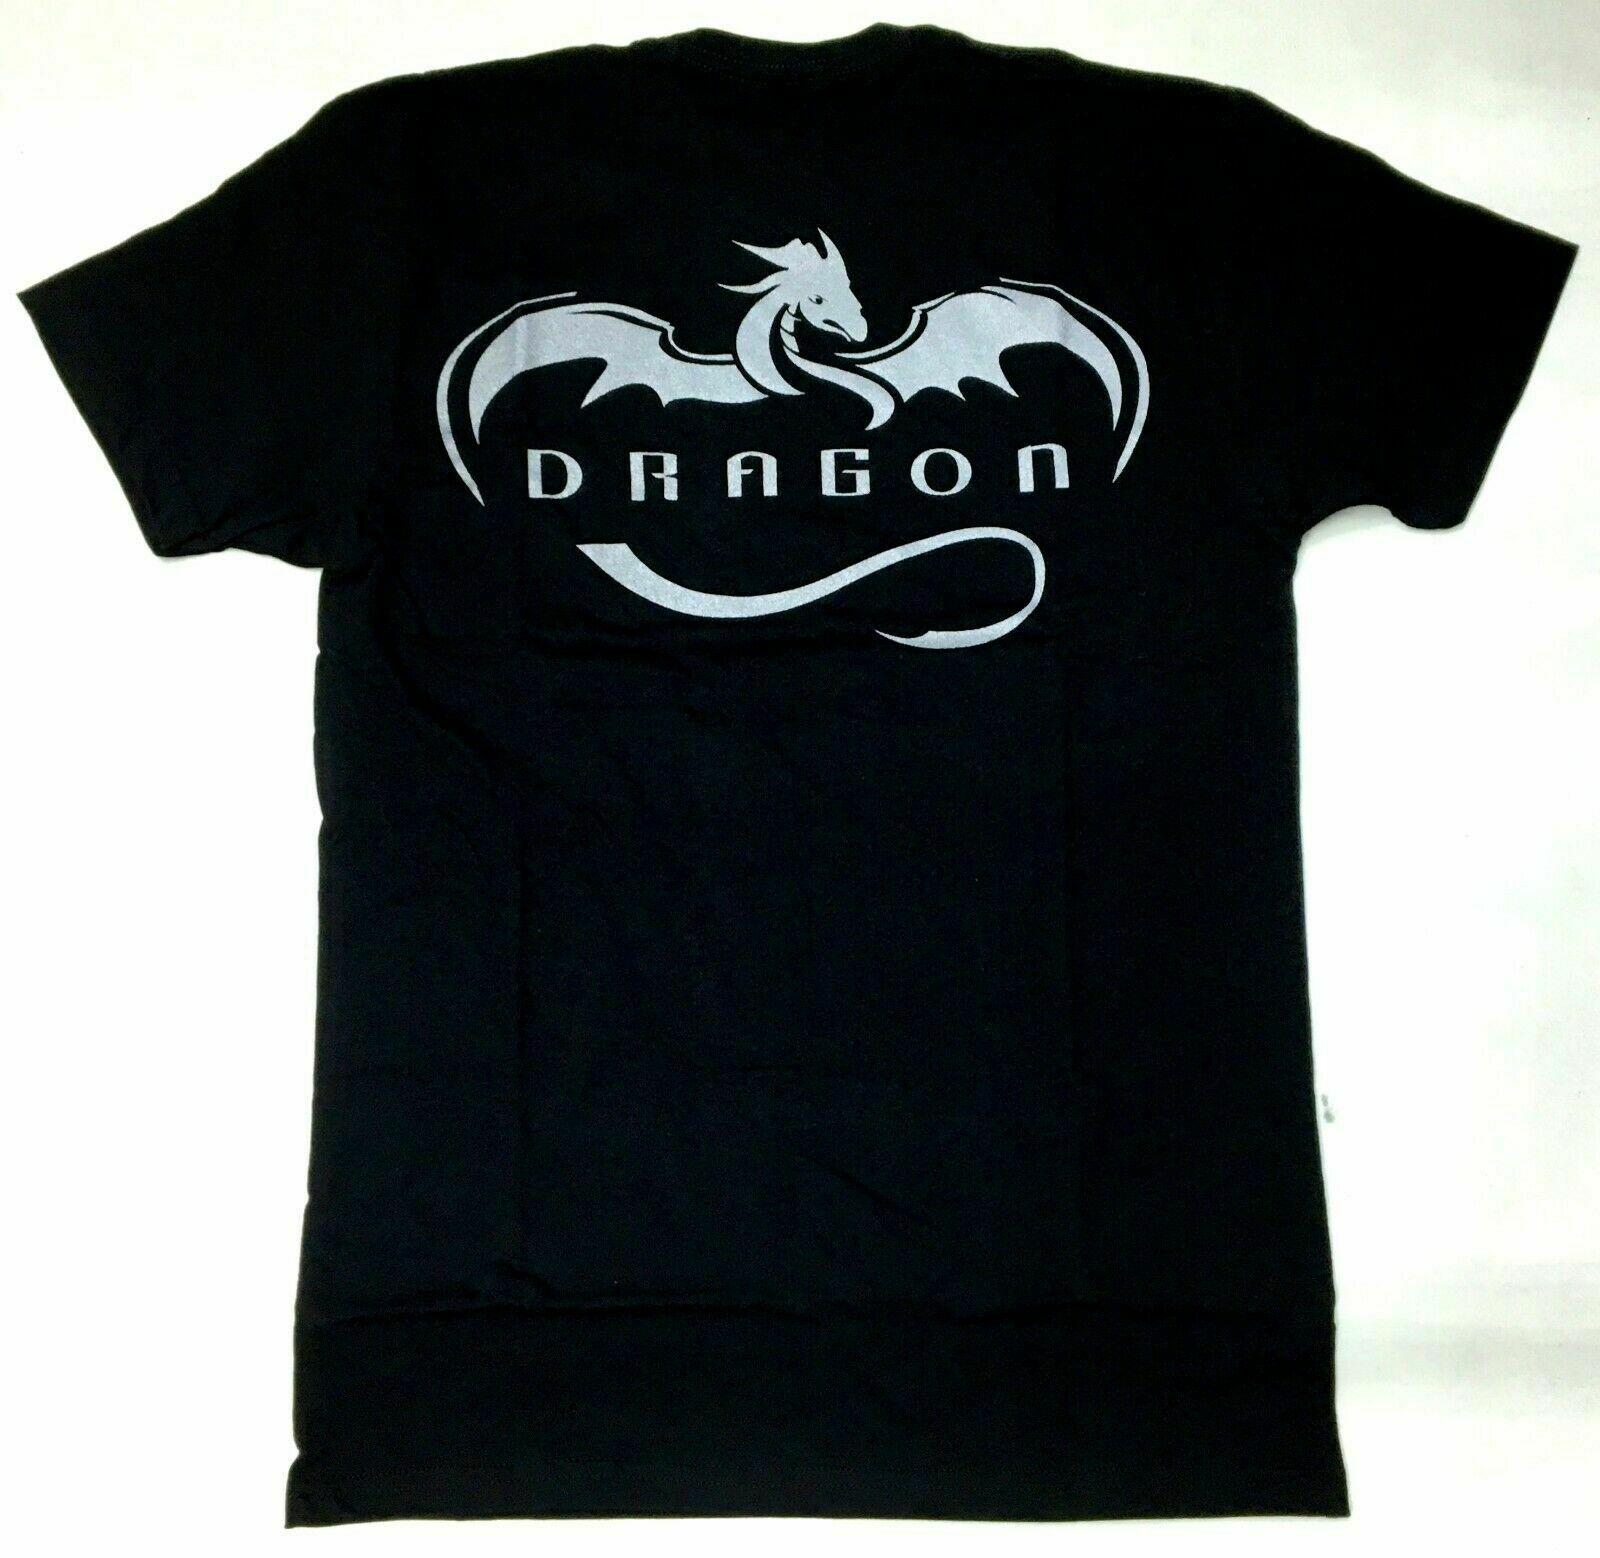 Spacex elon musk prata dragão t camisa nwt 100 autêntico oficial raro s 5xl